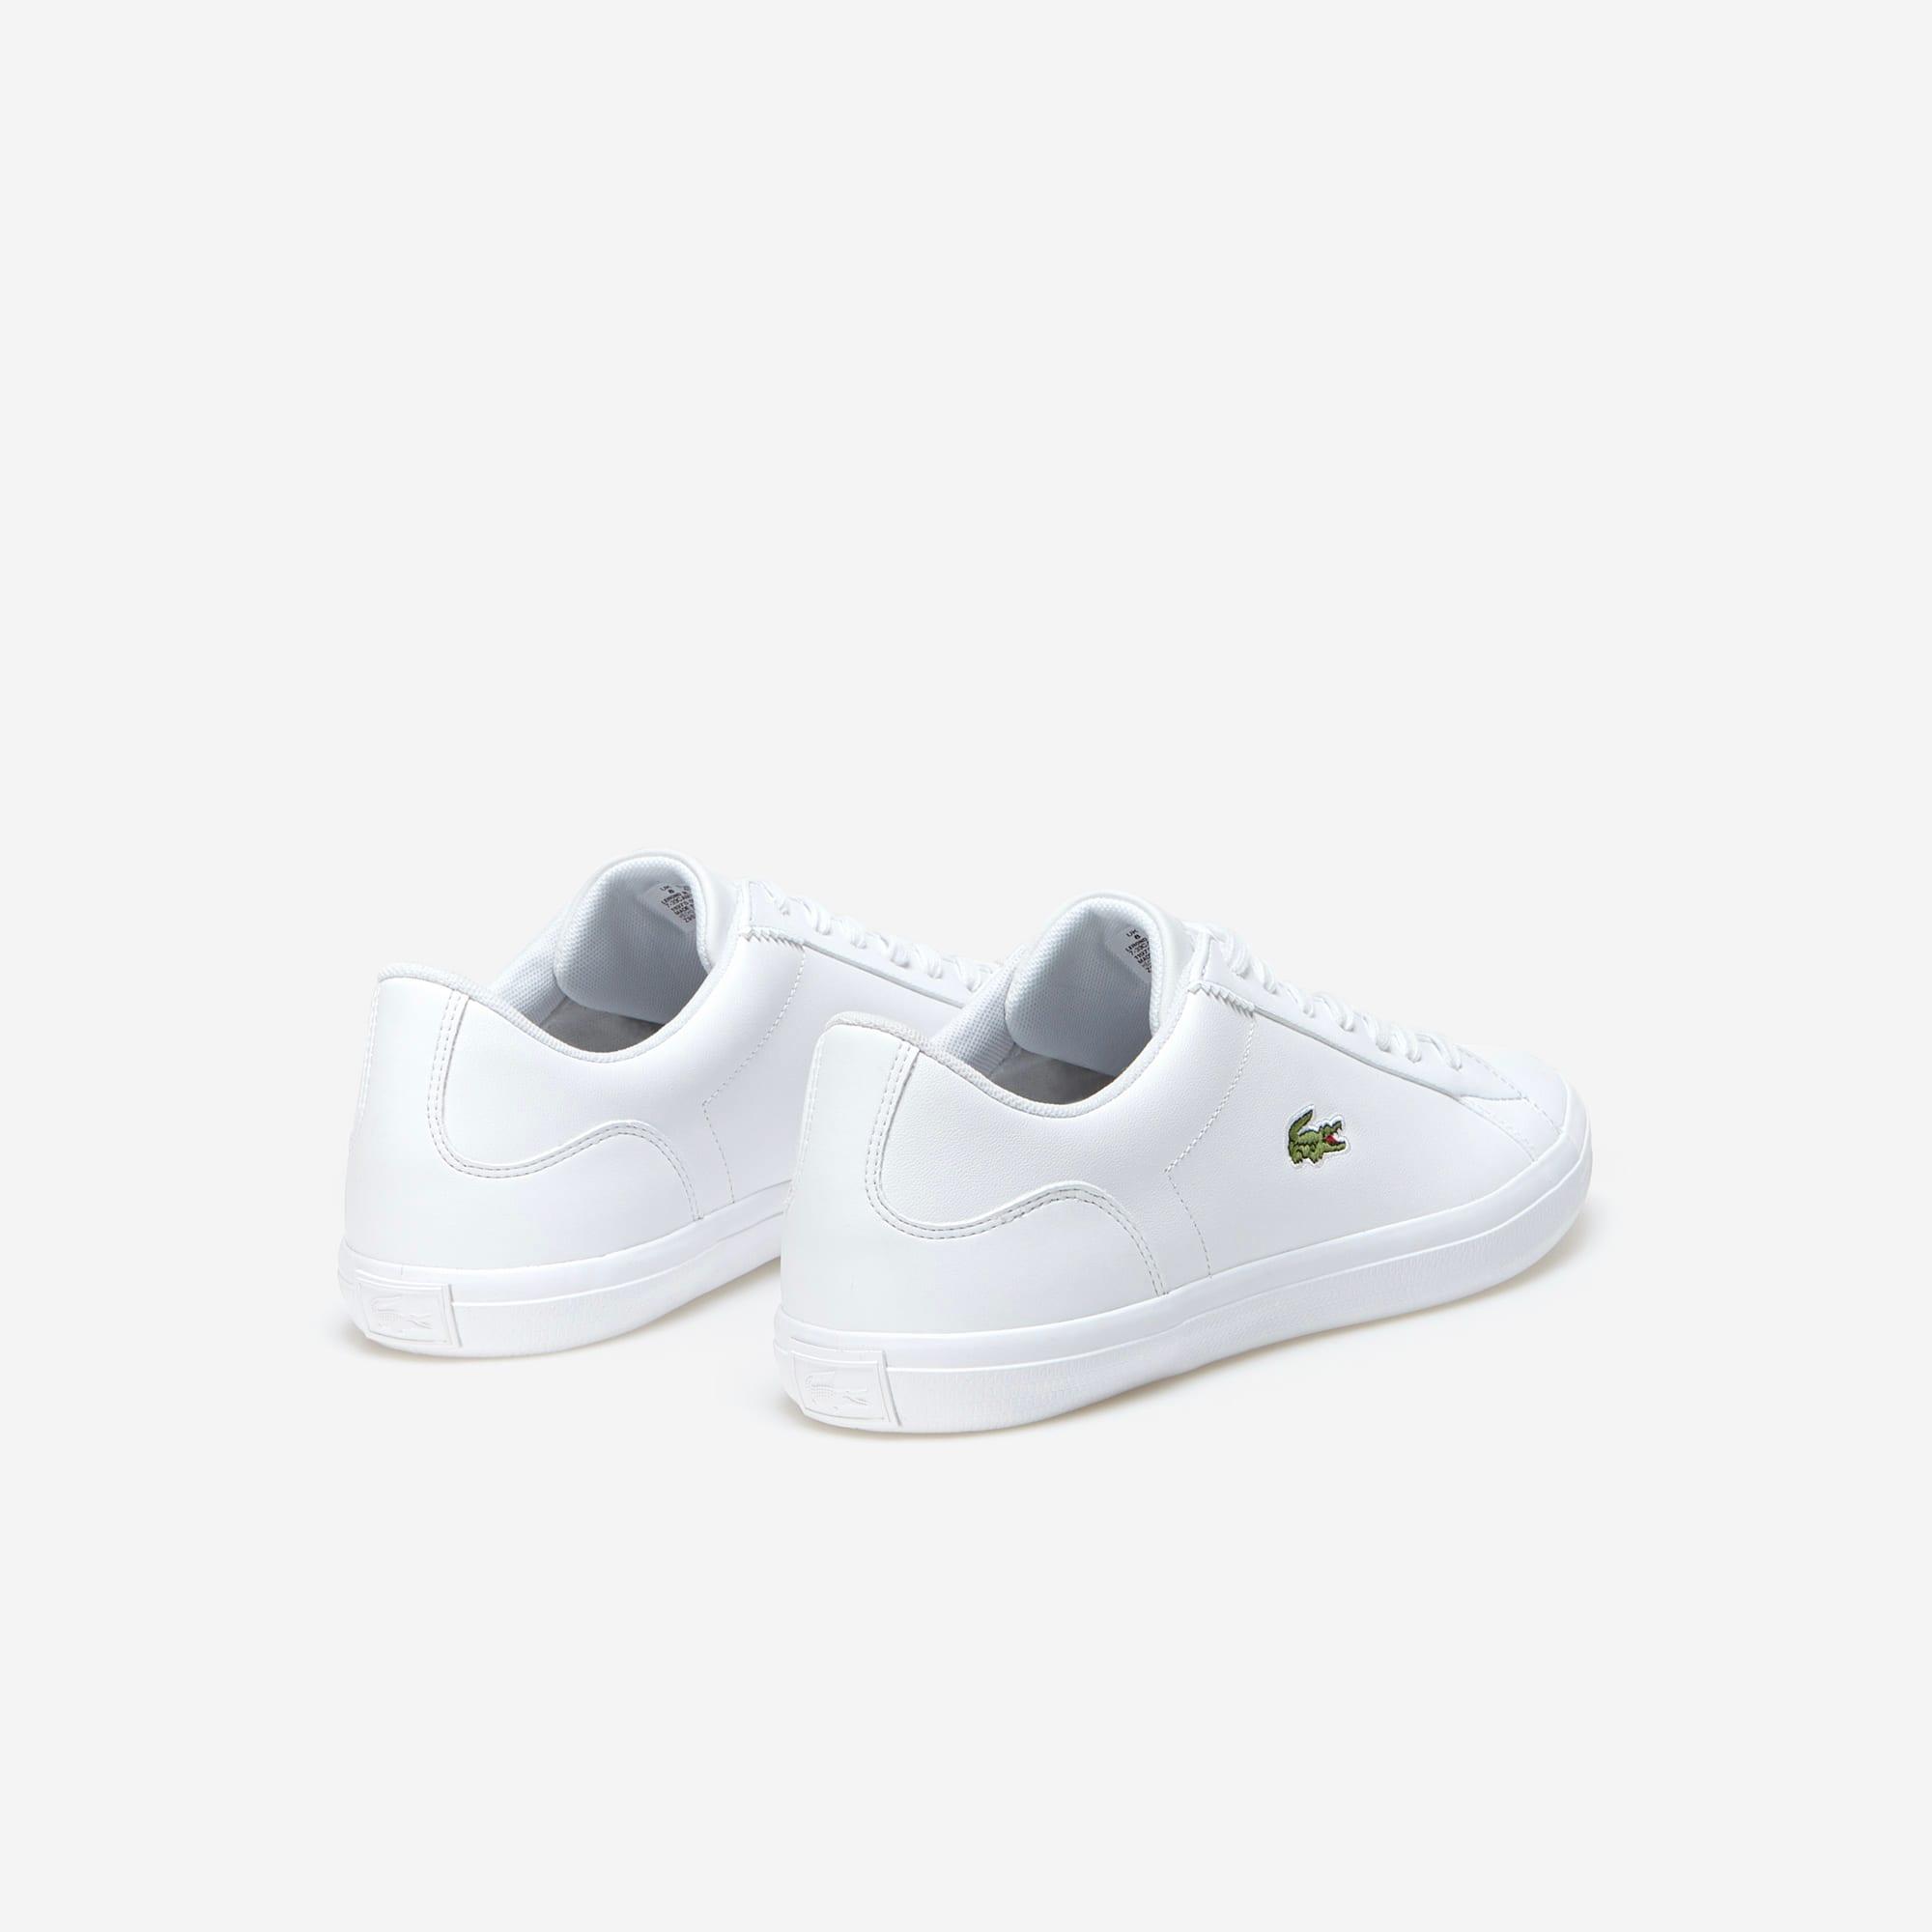 Lacoste - Herren-Sneakers LEROND aus einfarbigem Leder - 3